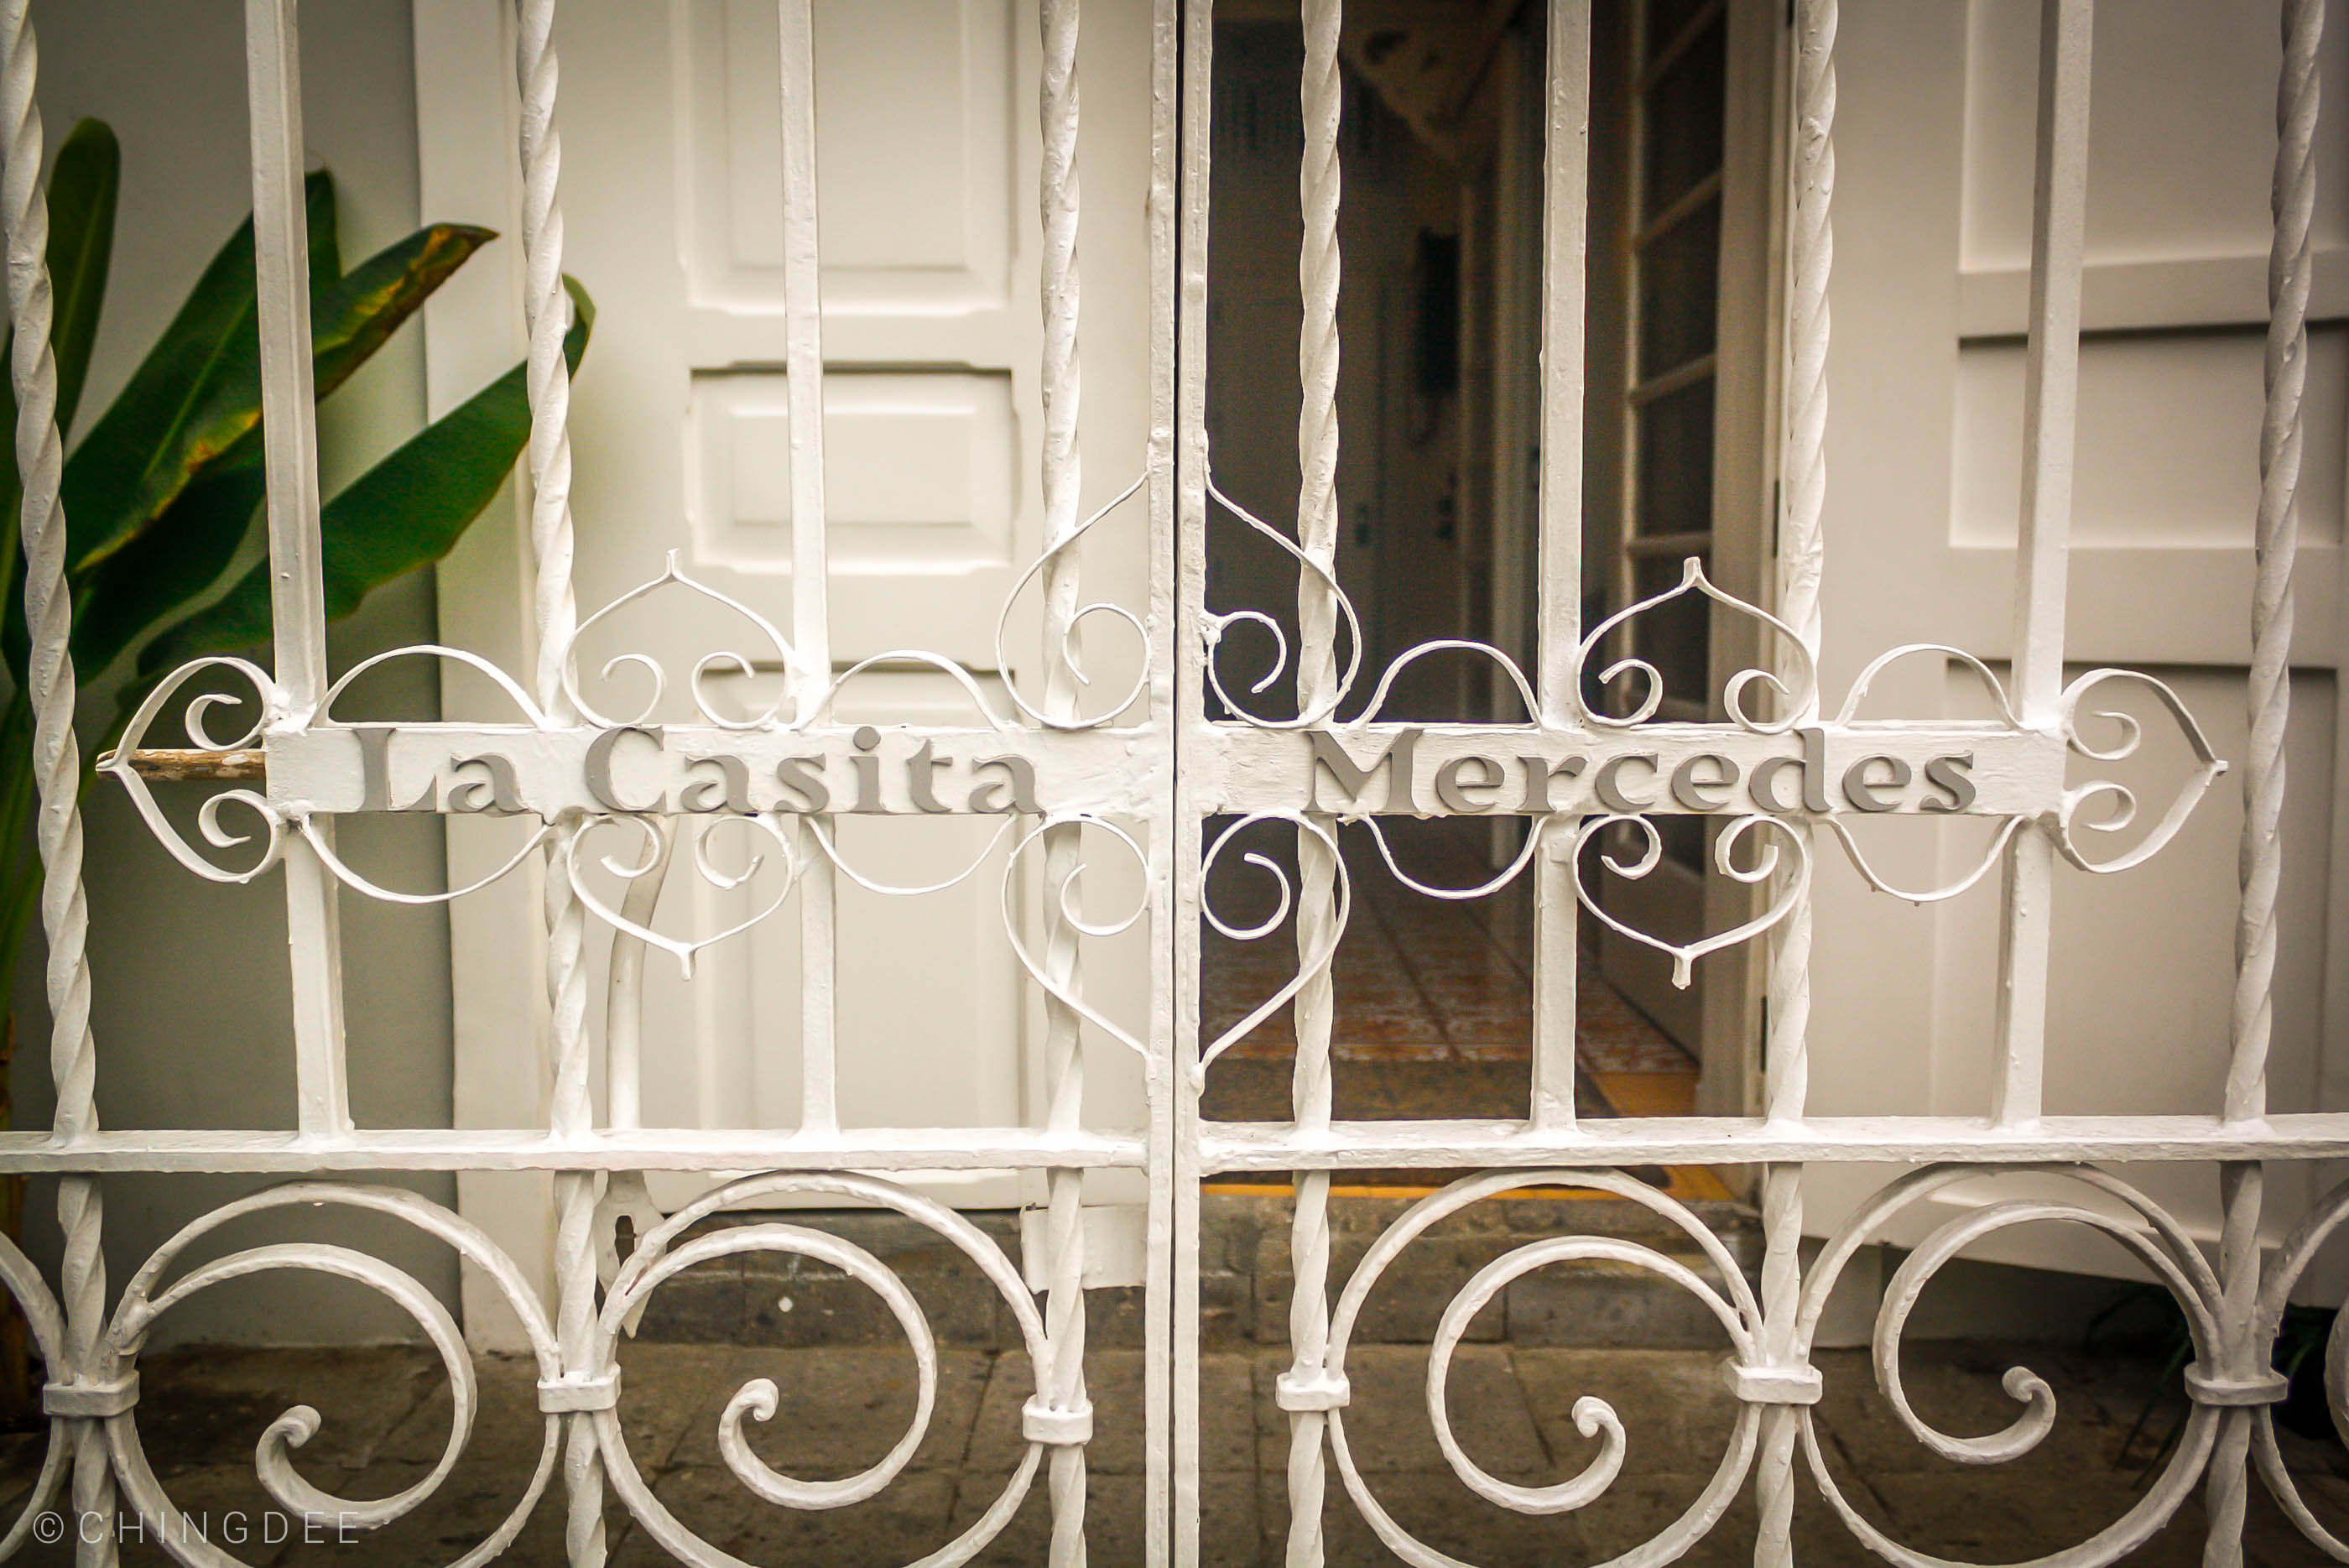 La Casita Mercedes' front gate